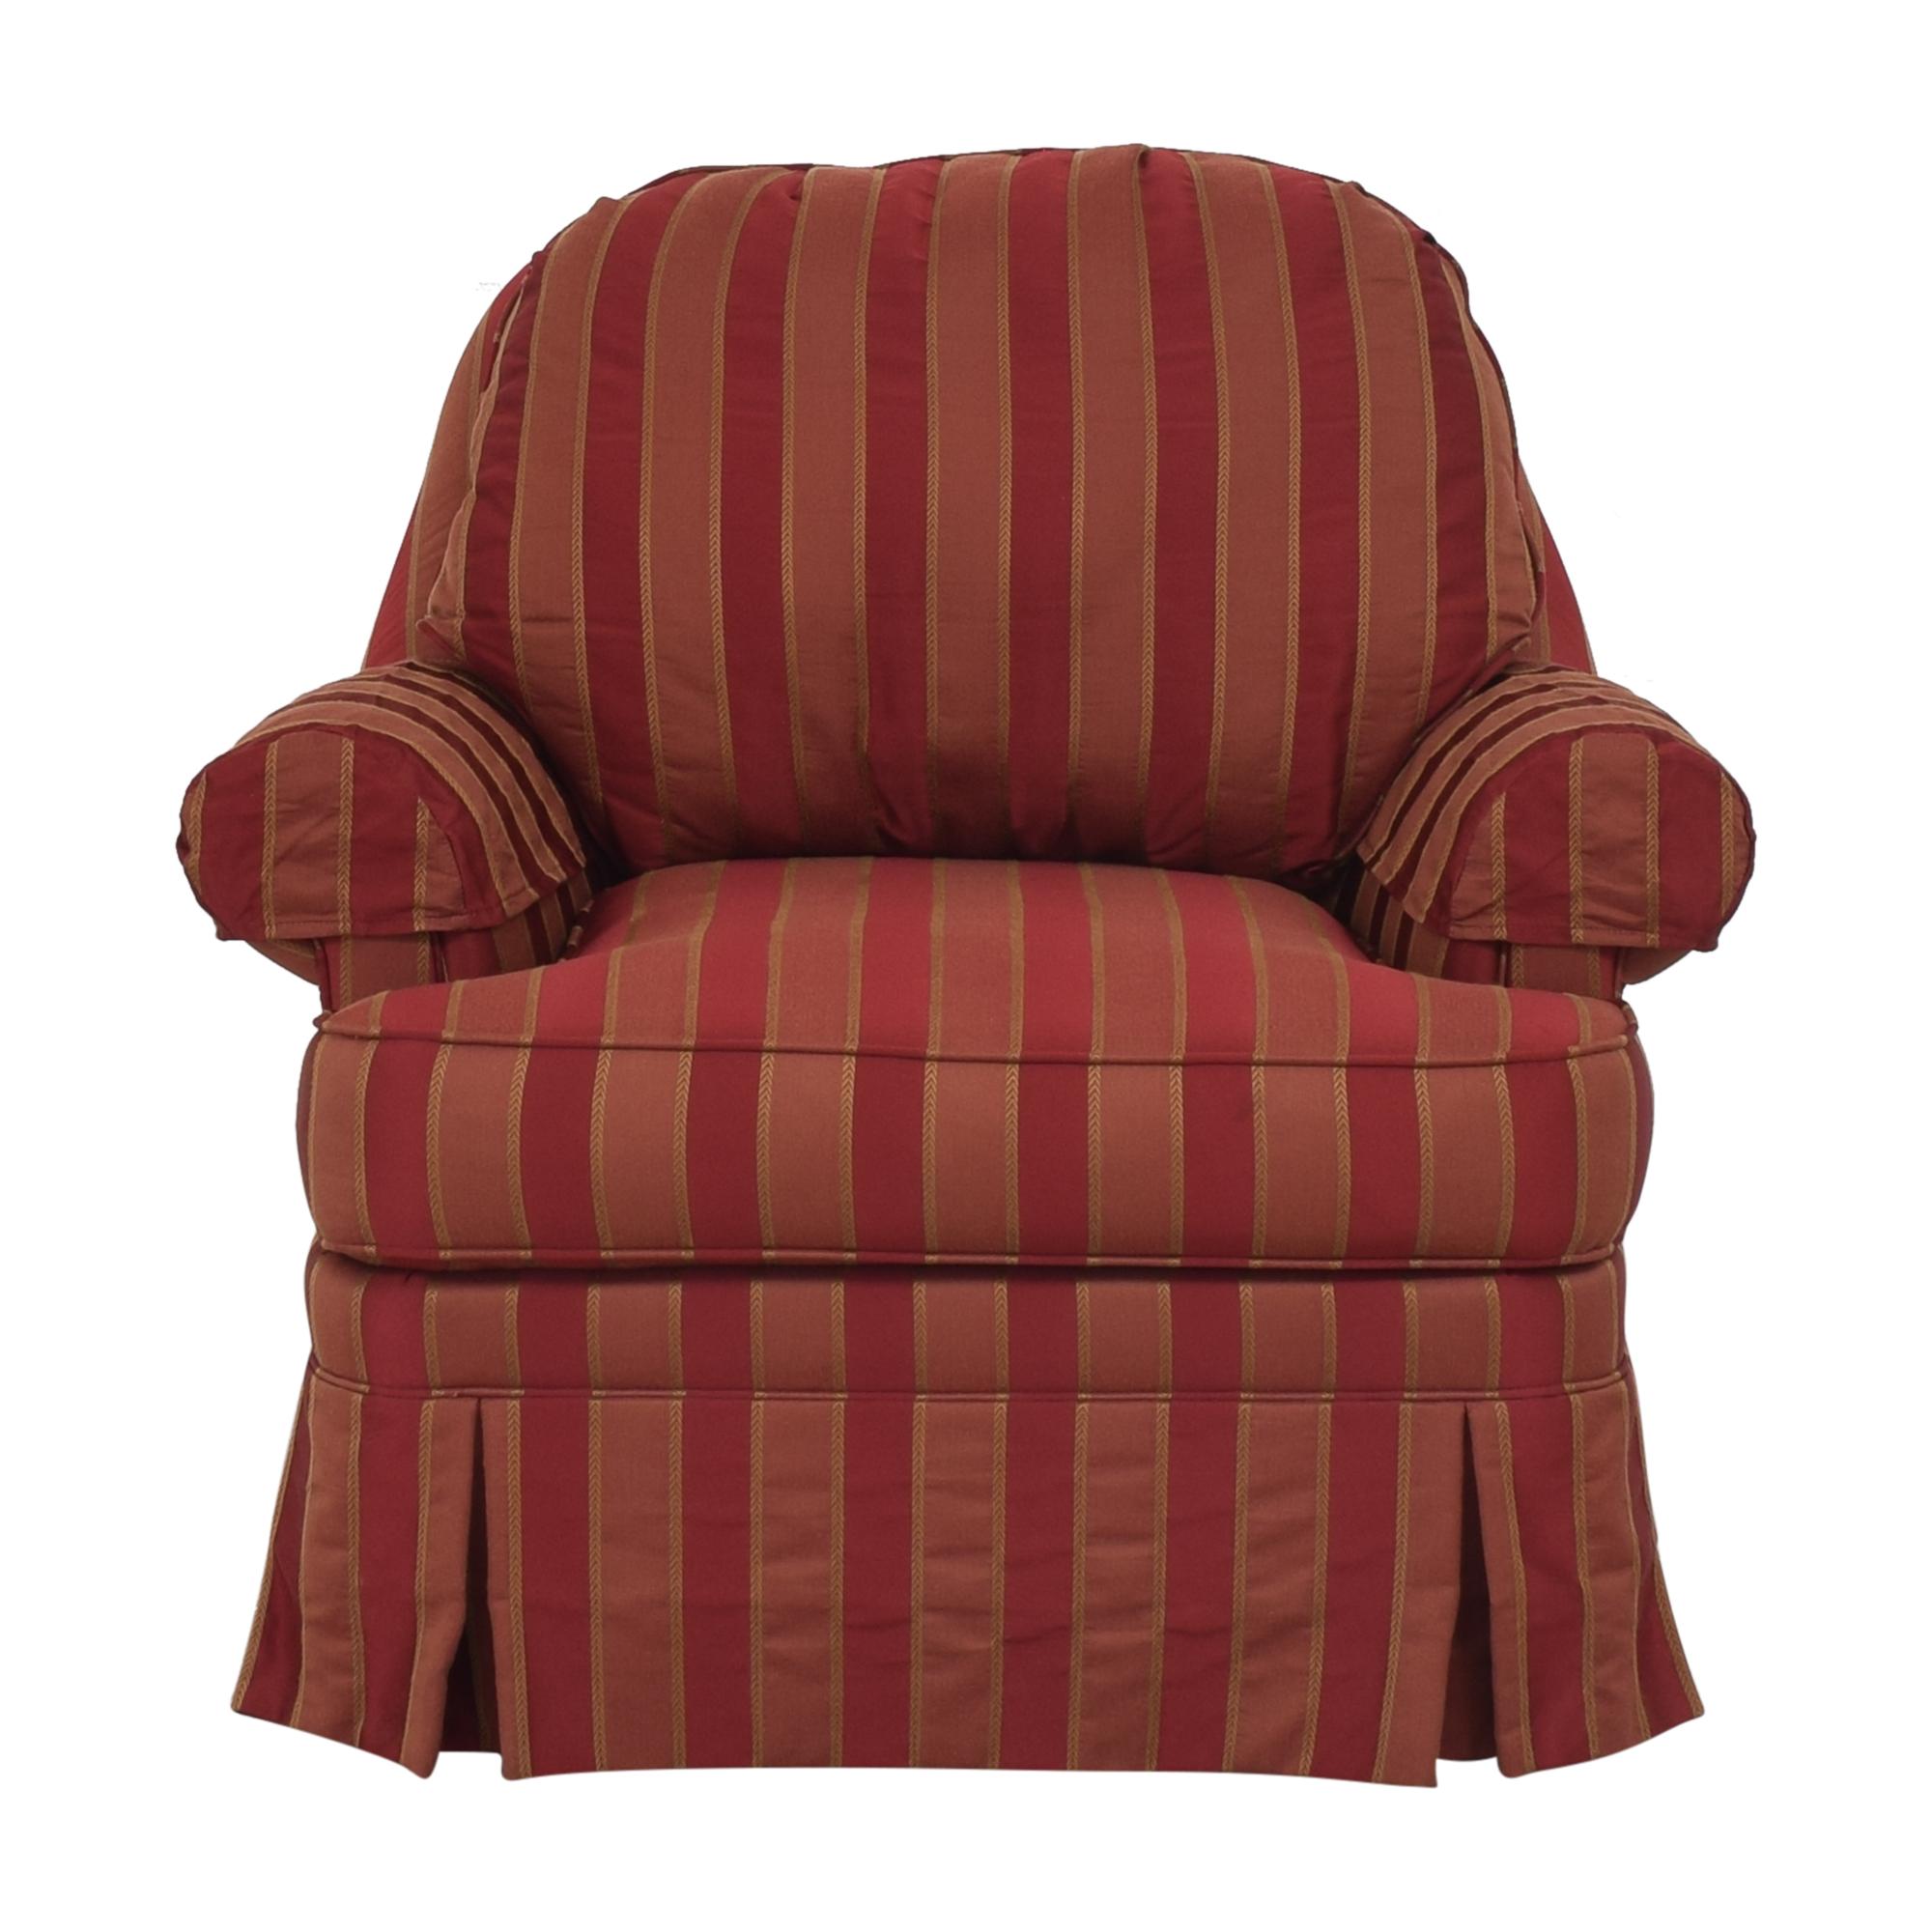 shop Ethan Allen Skirted Swivel Chair Ethan Allen Accent Chairs